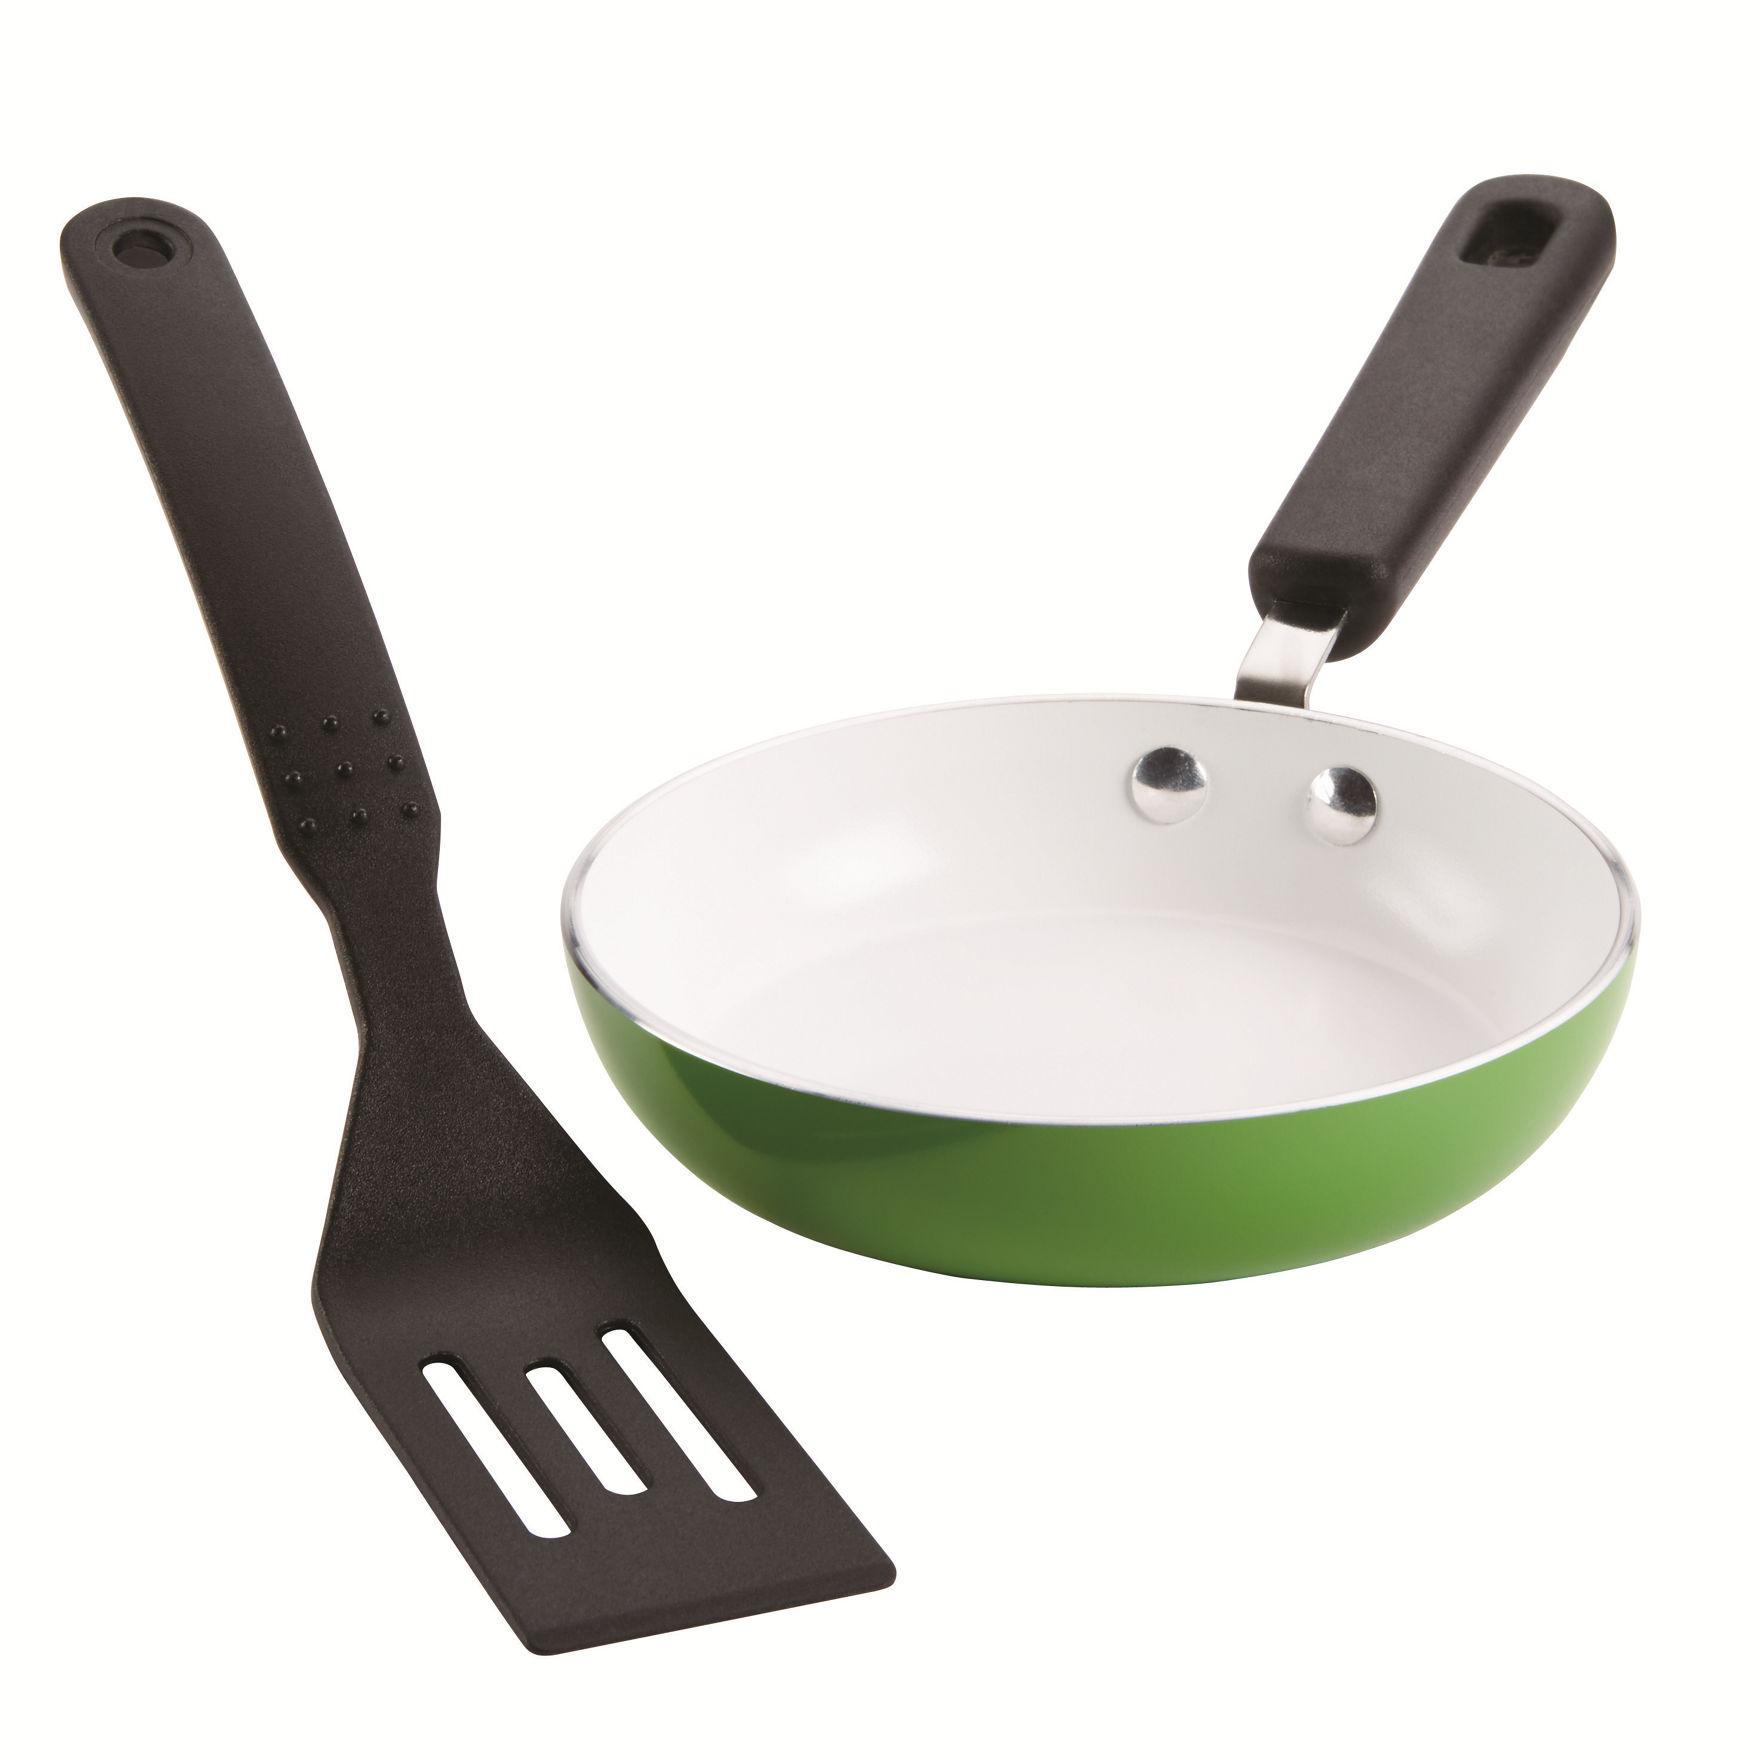 Silverstone Kiwi Frying Pans & Skillets Cookware